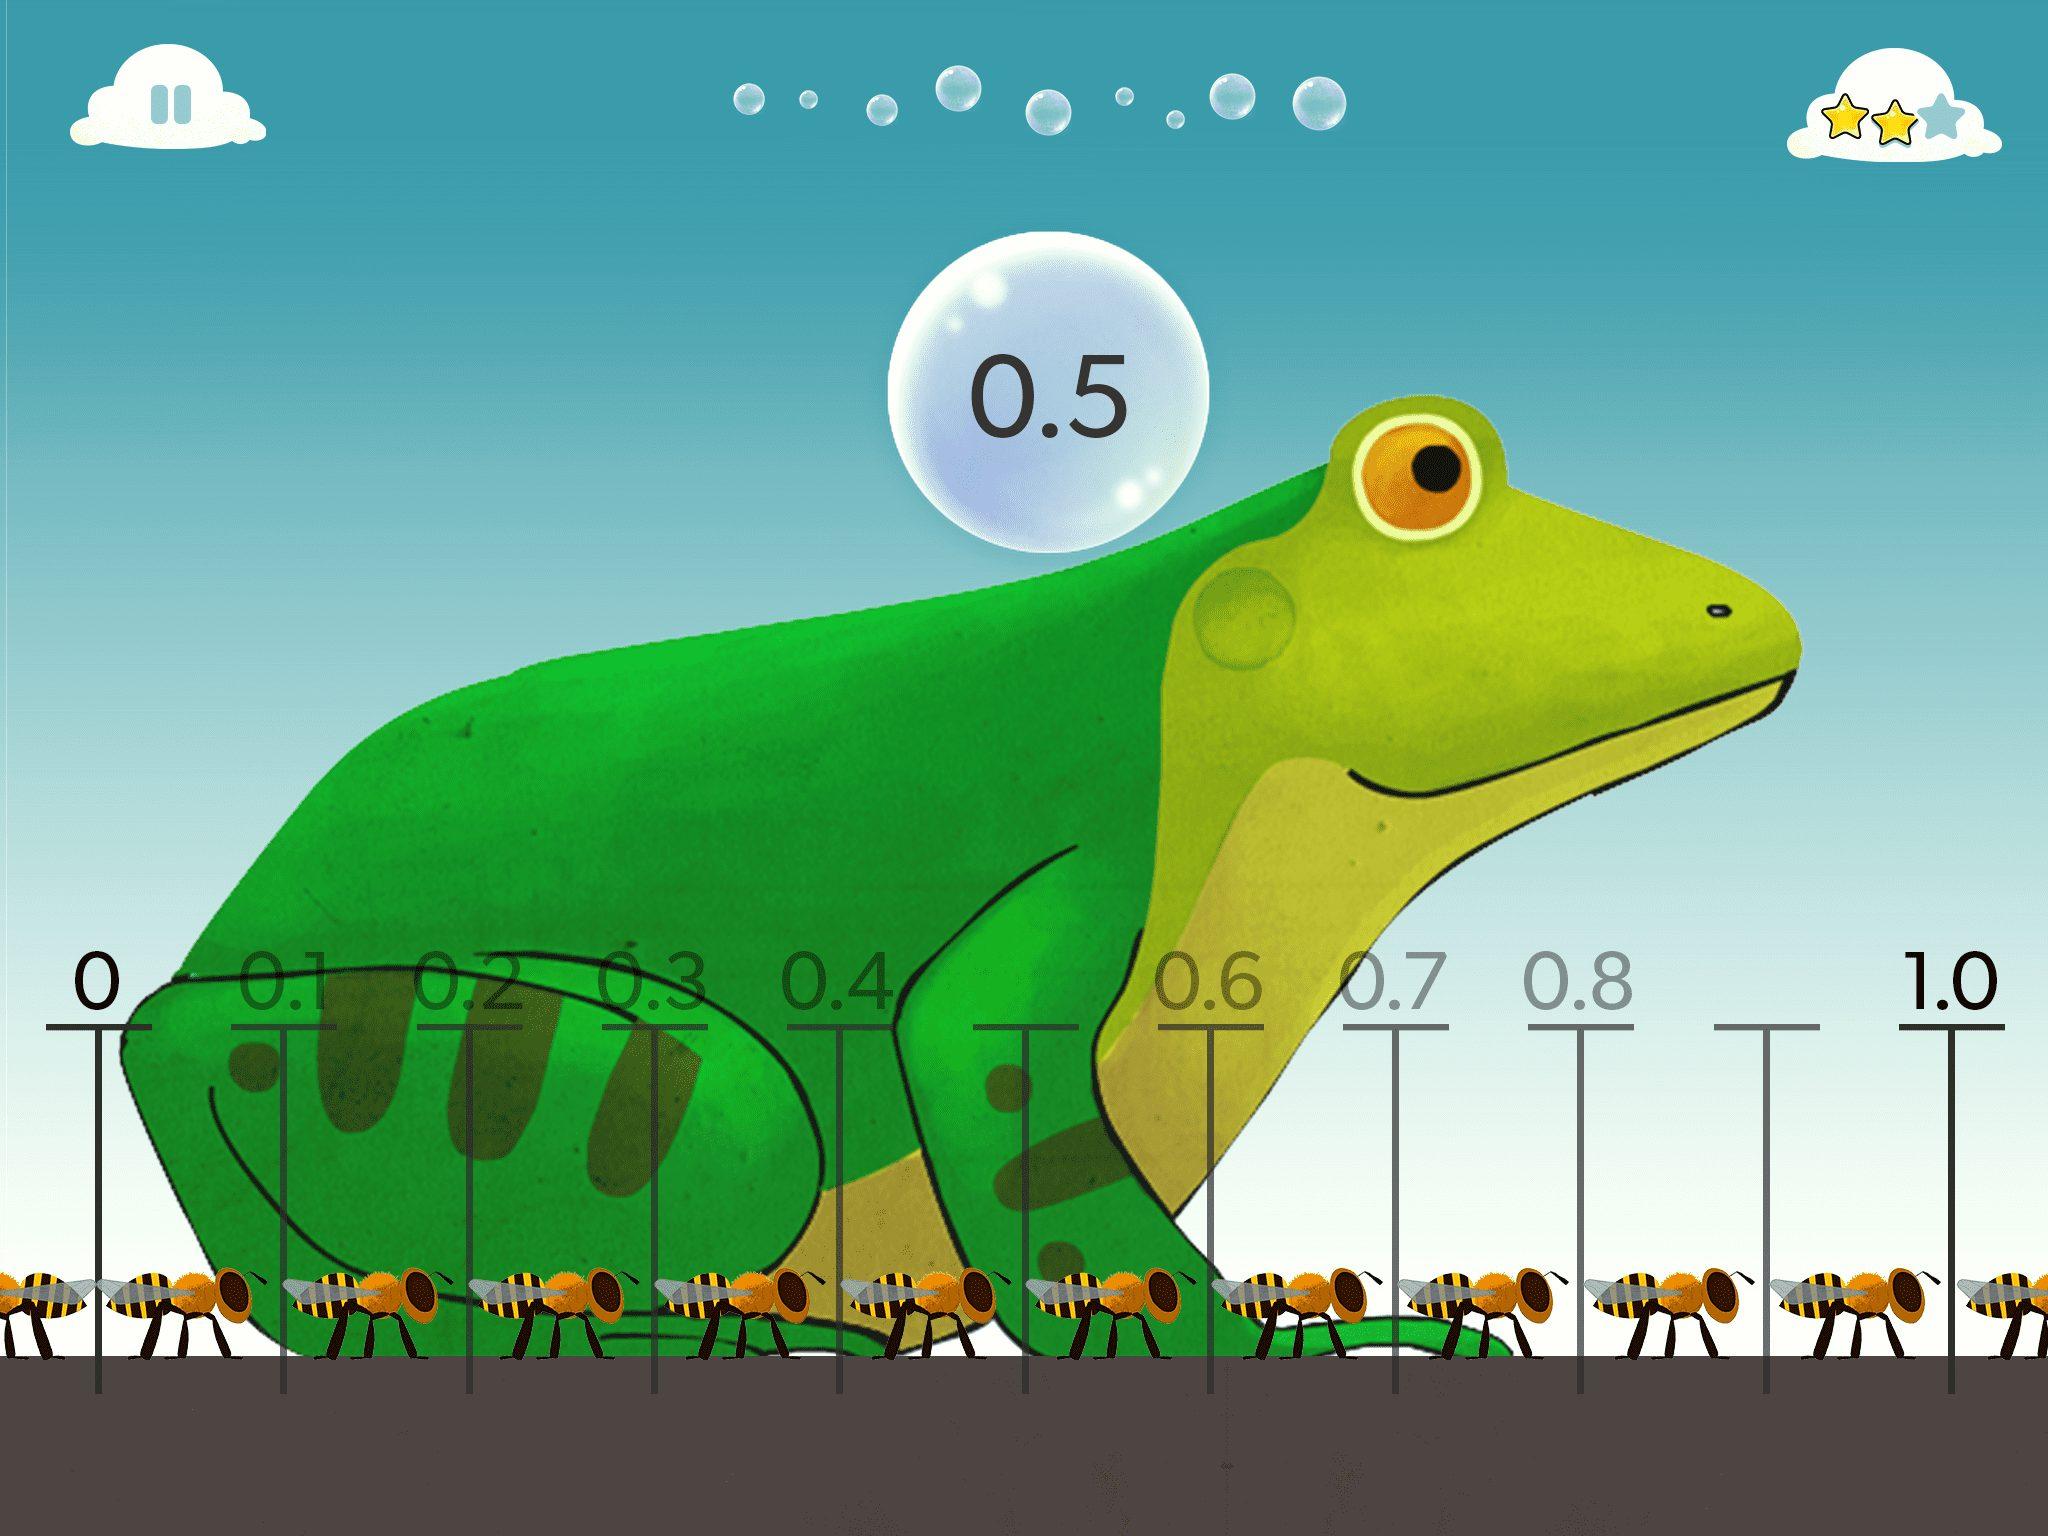 MotionMath educational app